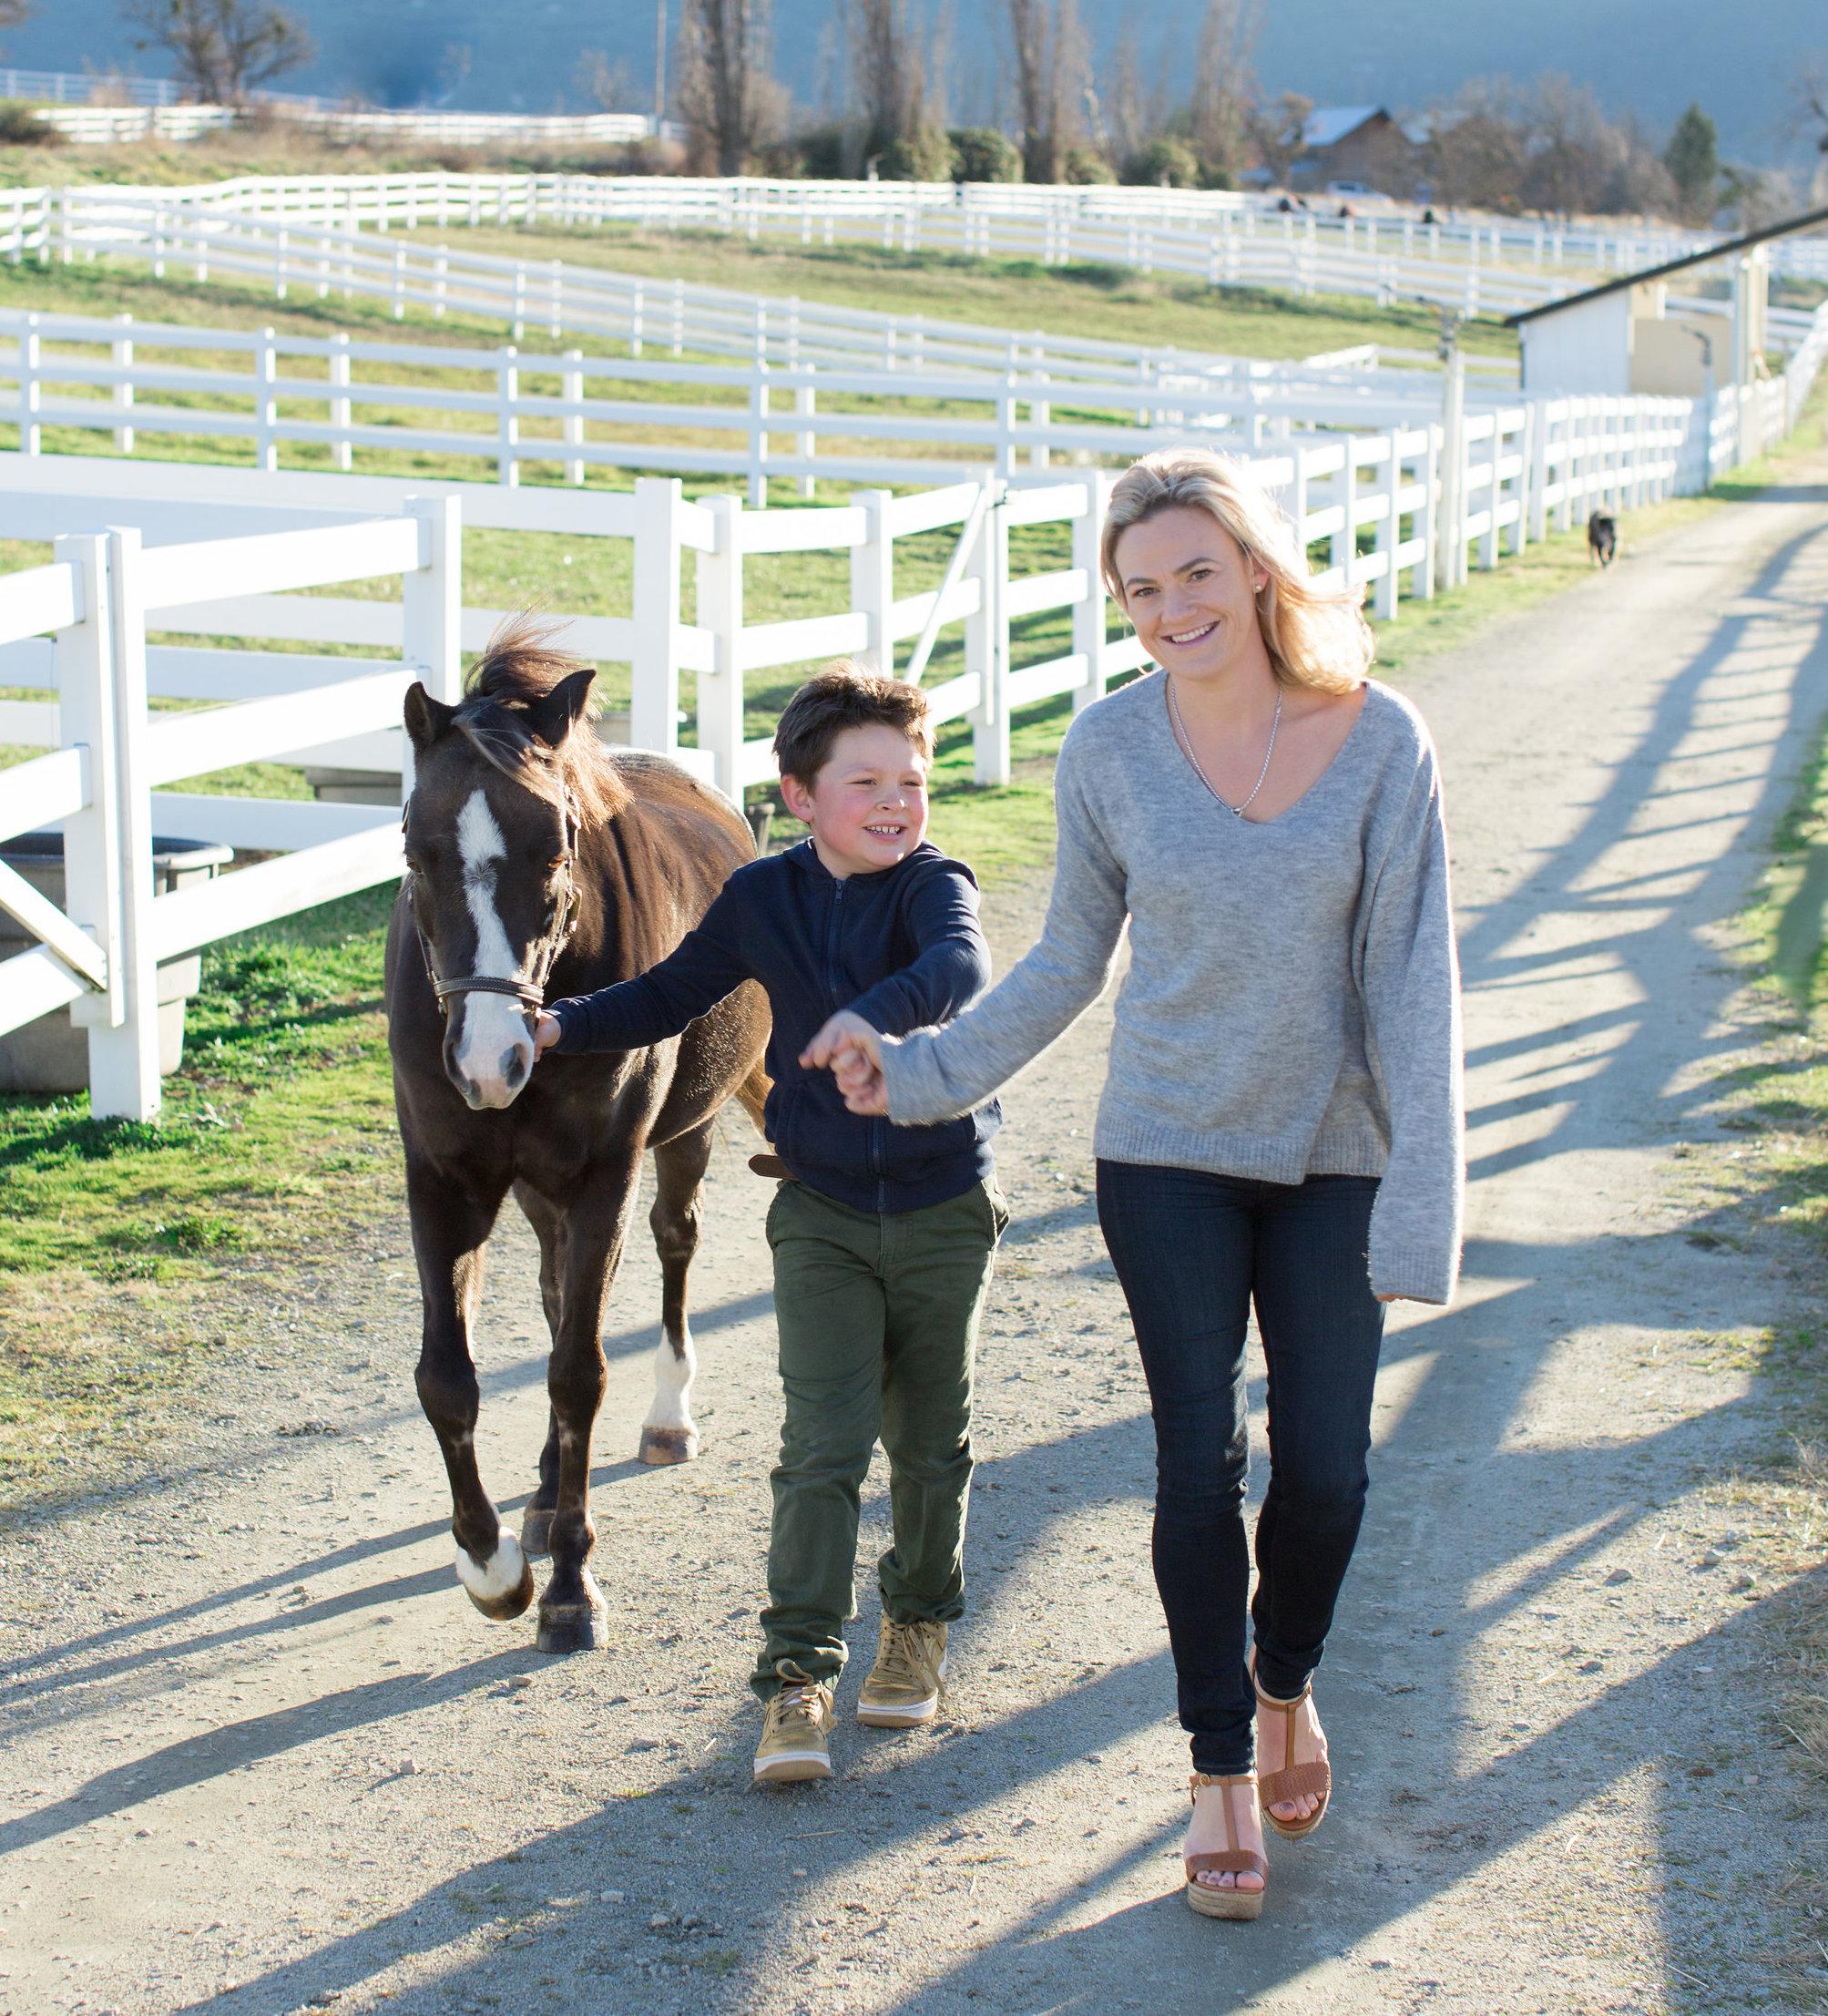 Lara and her son at Silver Spring Farm, Oregon